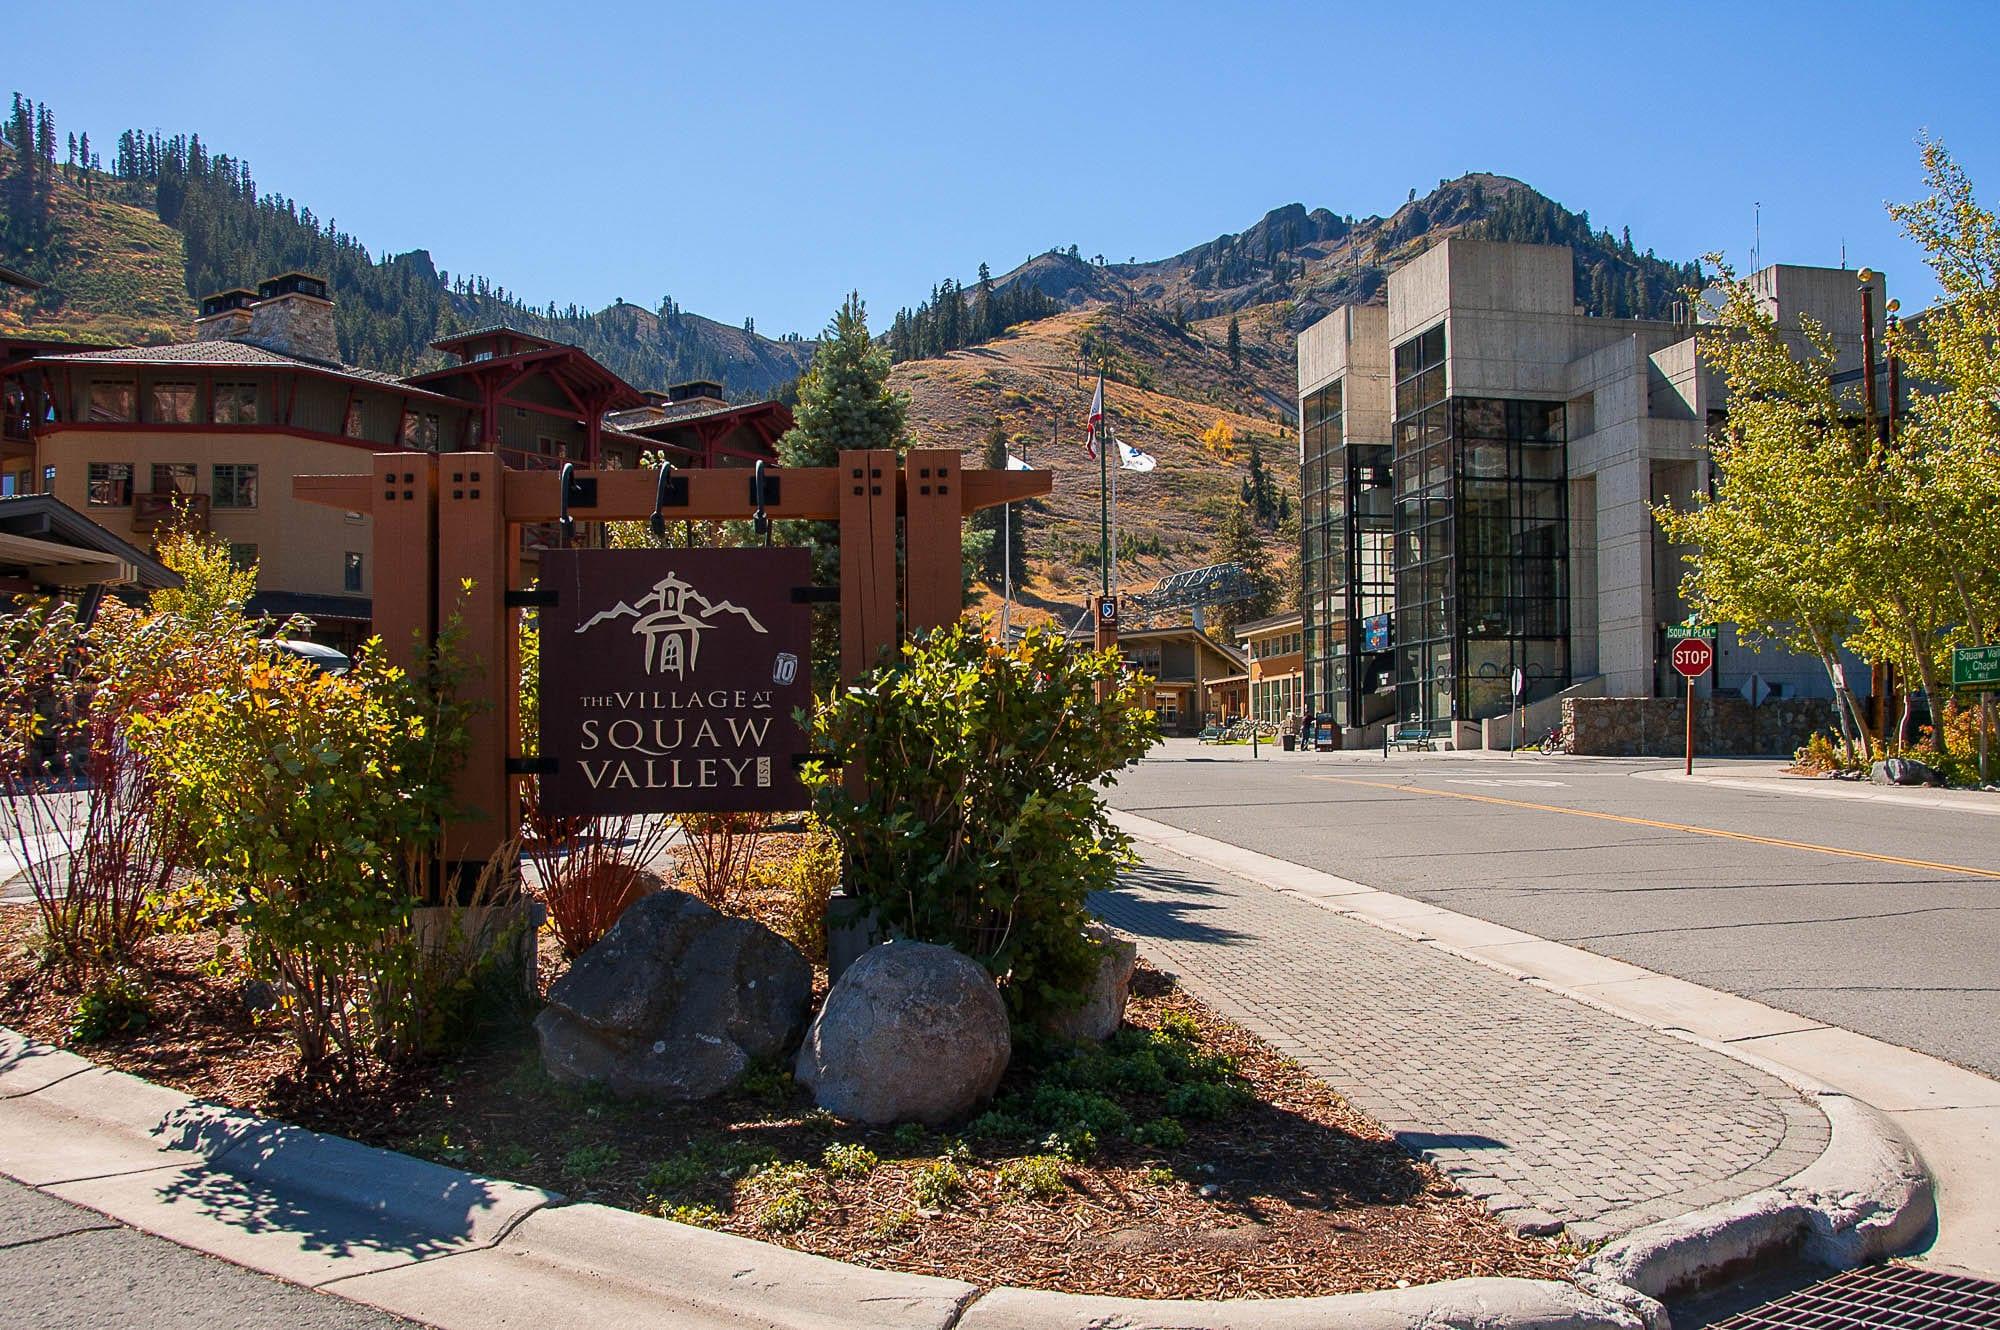 R_R Squaw Valley Entrance 04